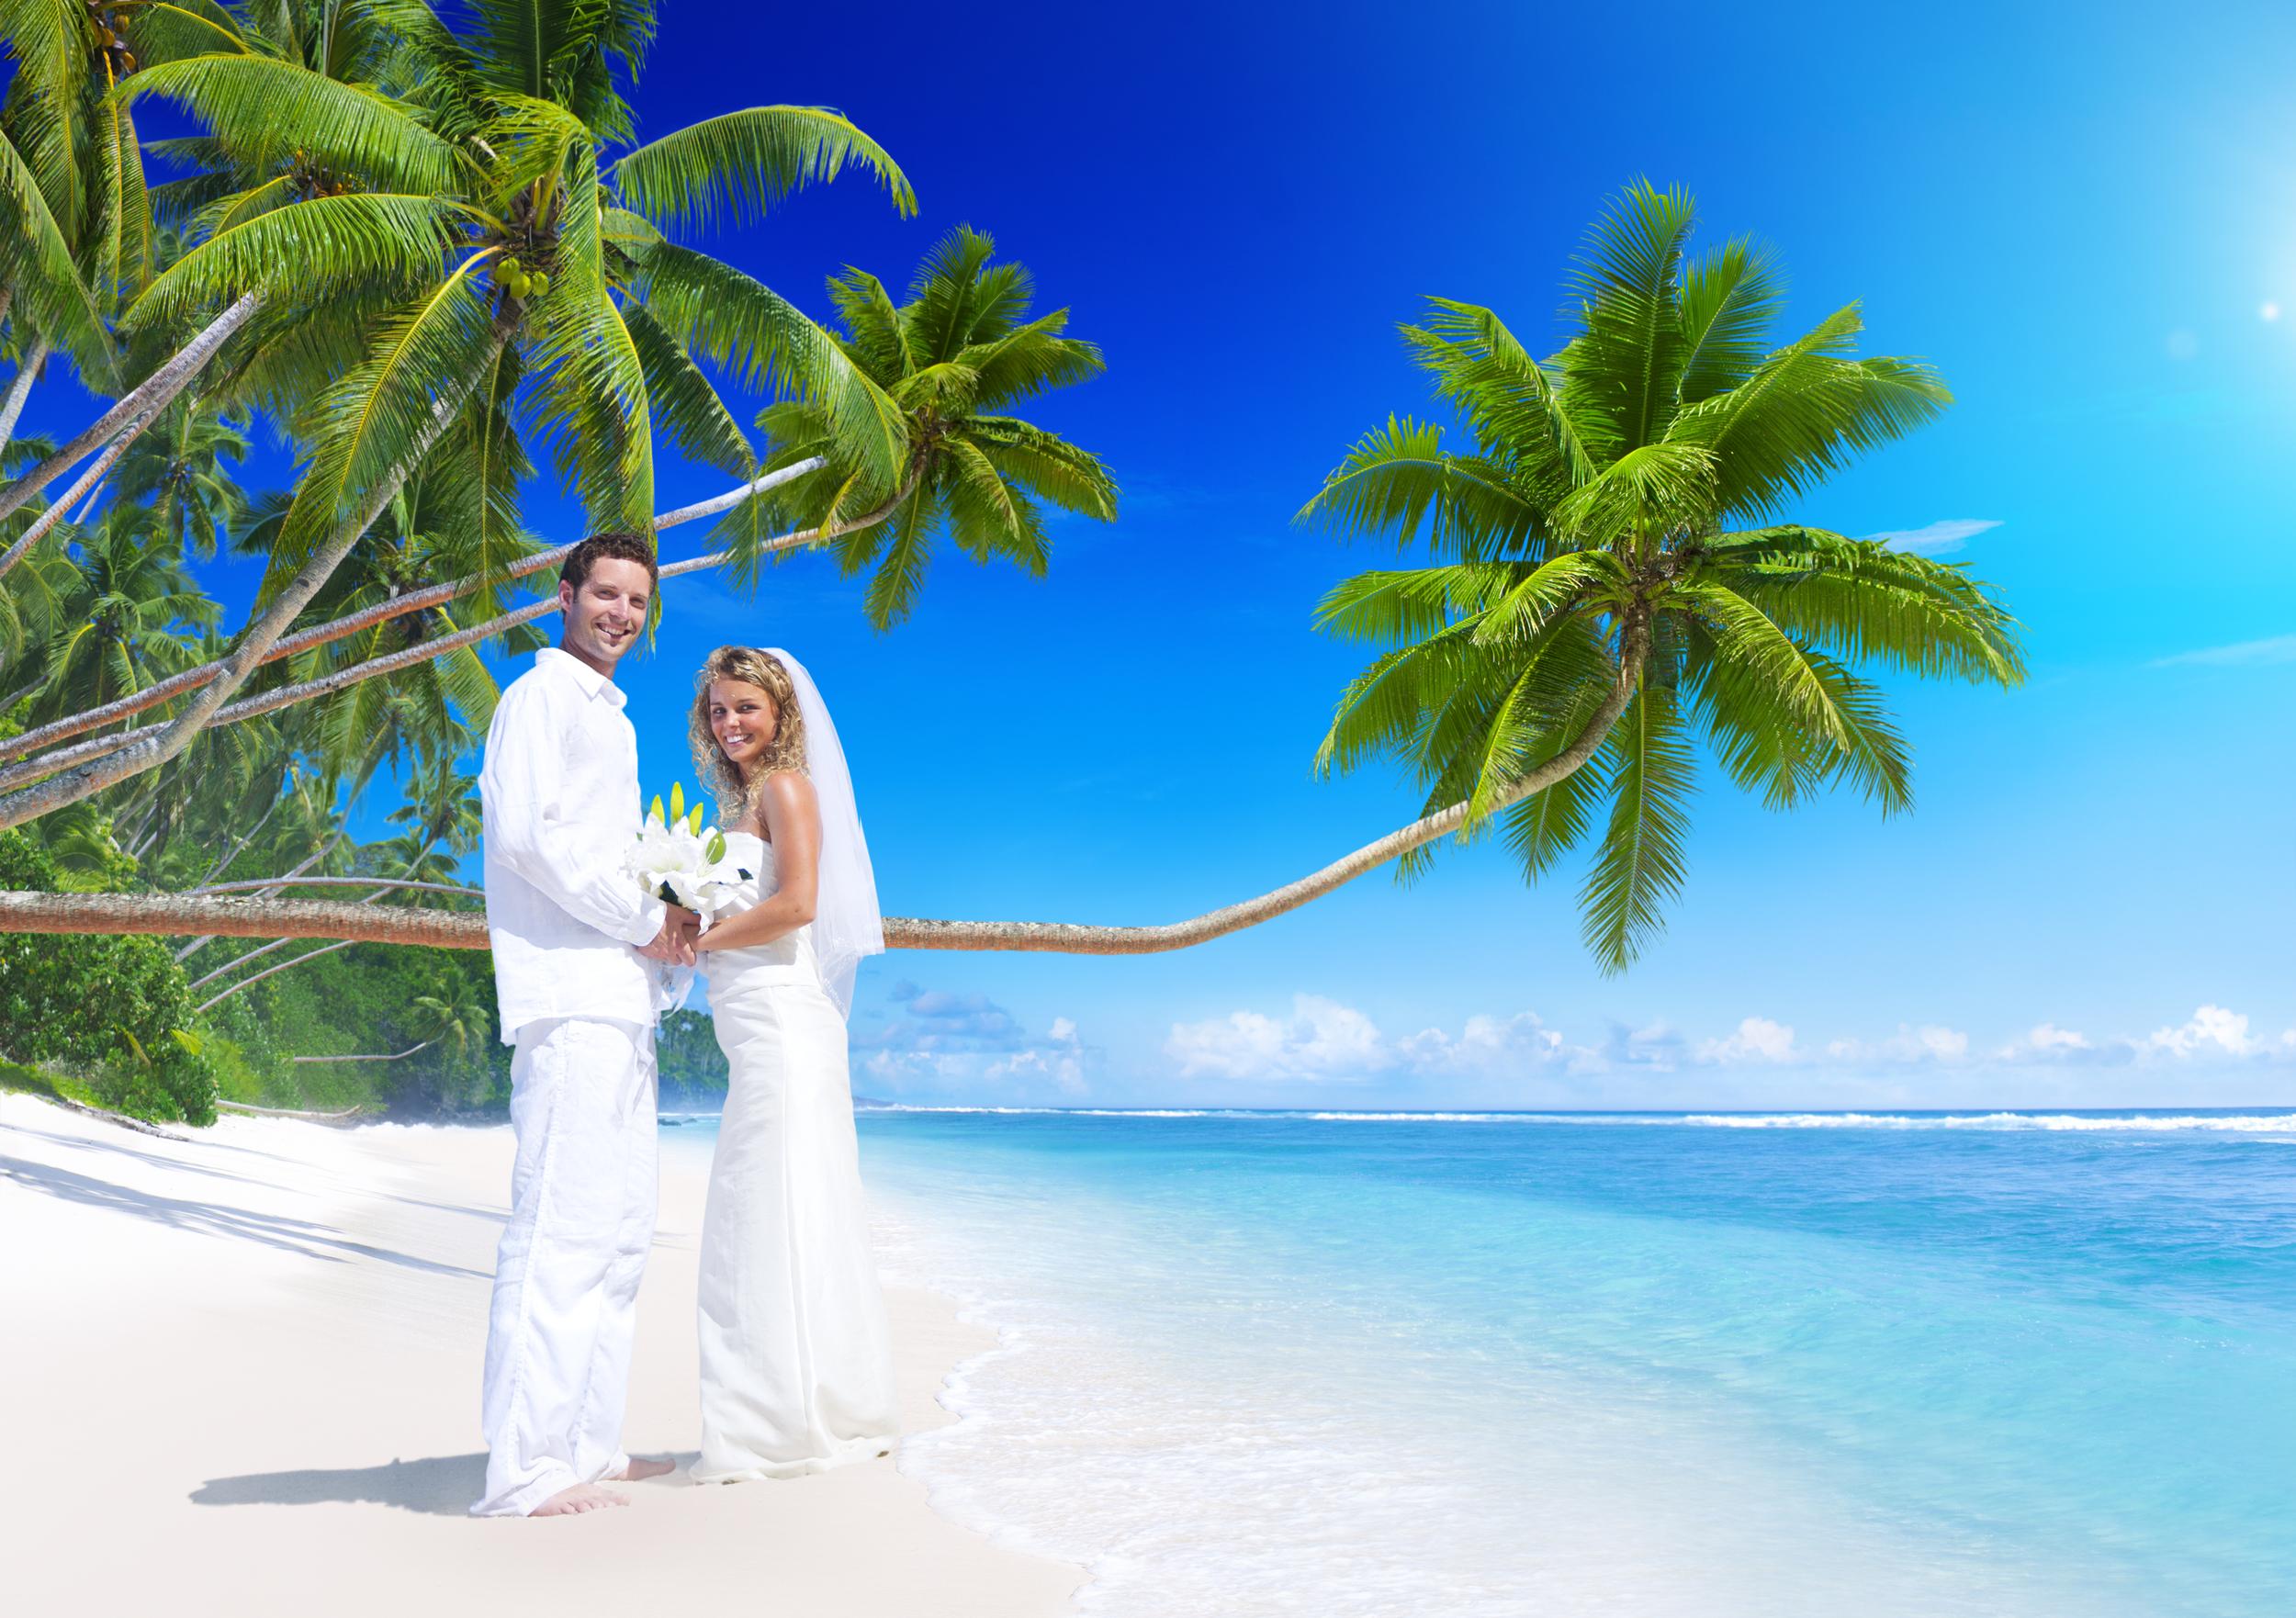 Enjoy a stress-free wedding in paradise. -